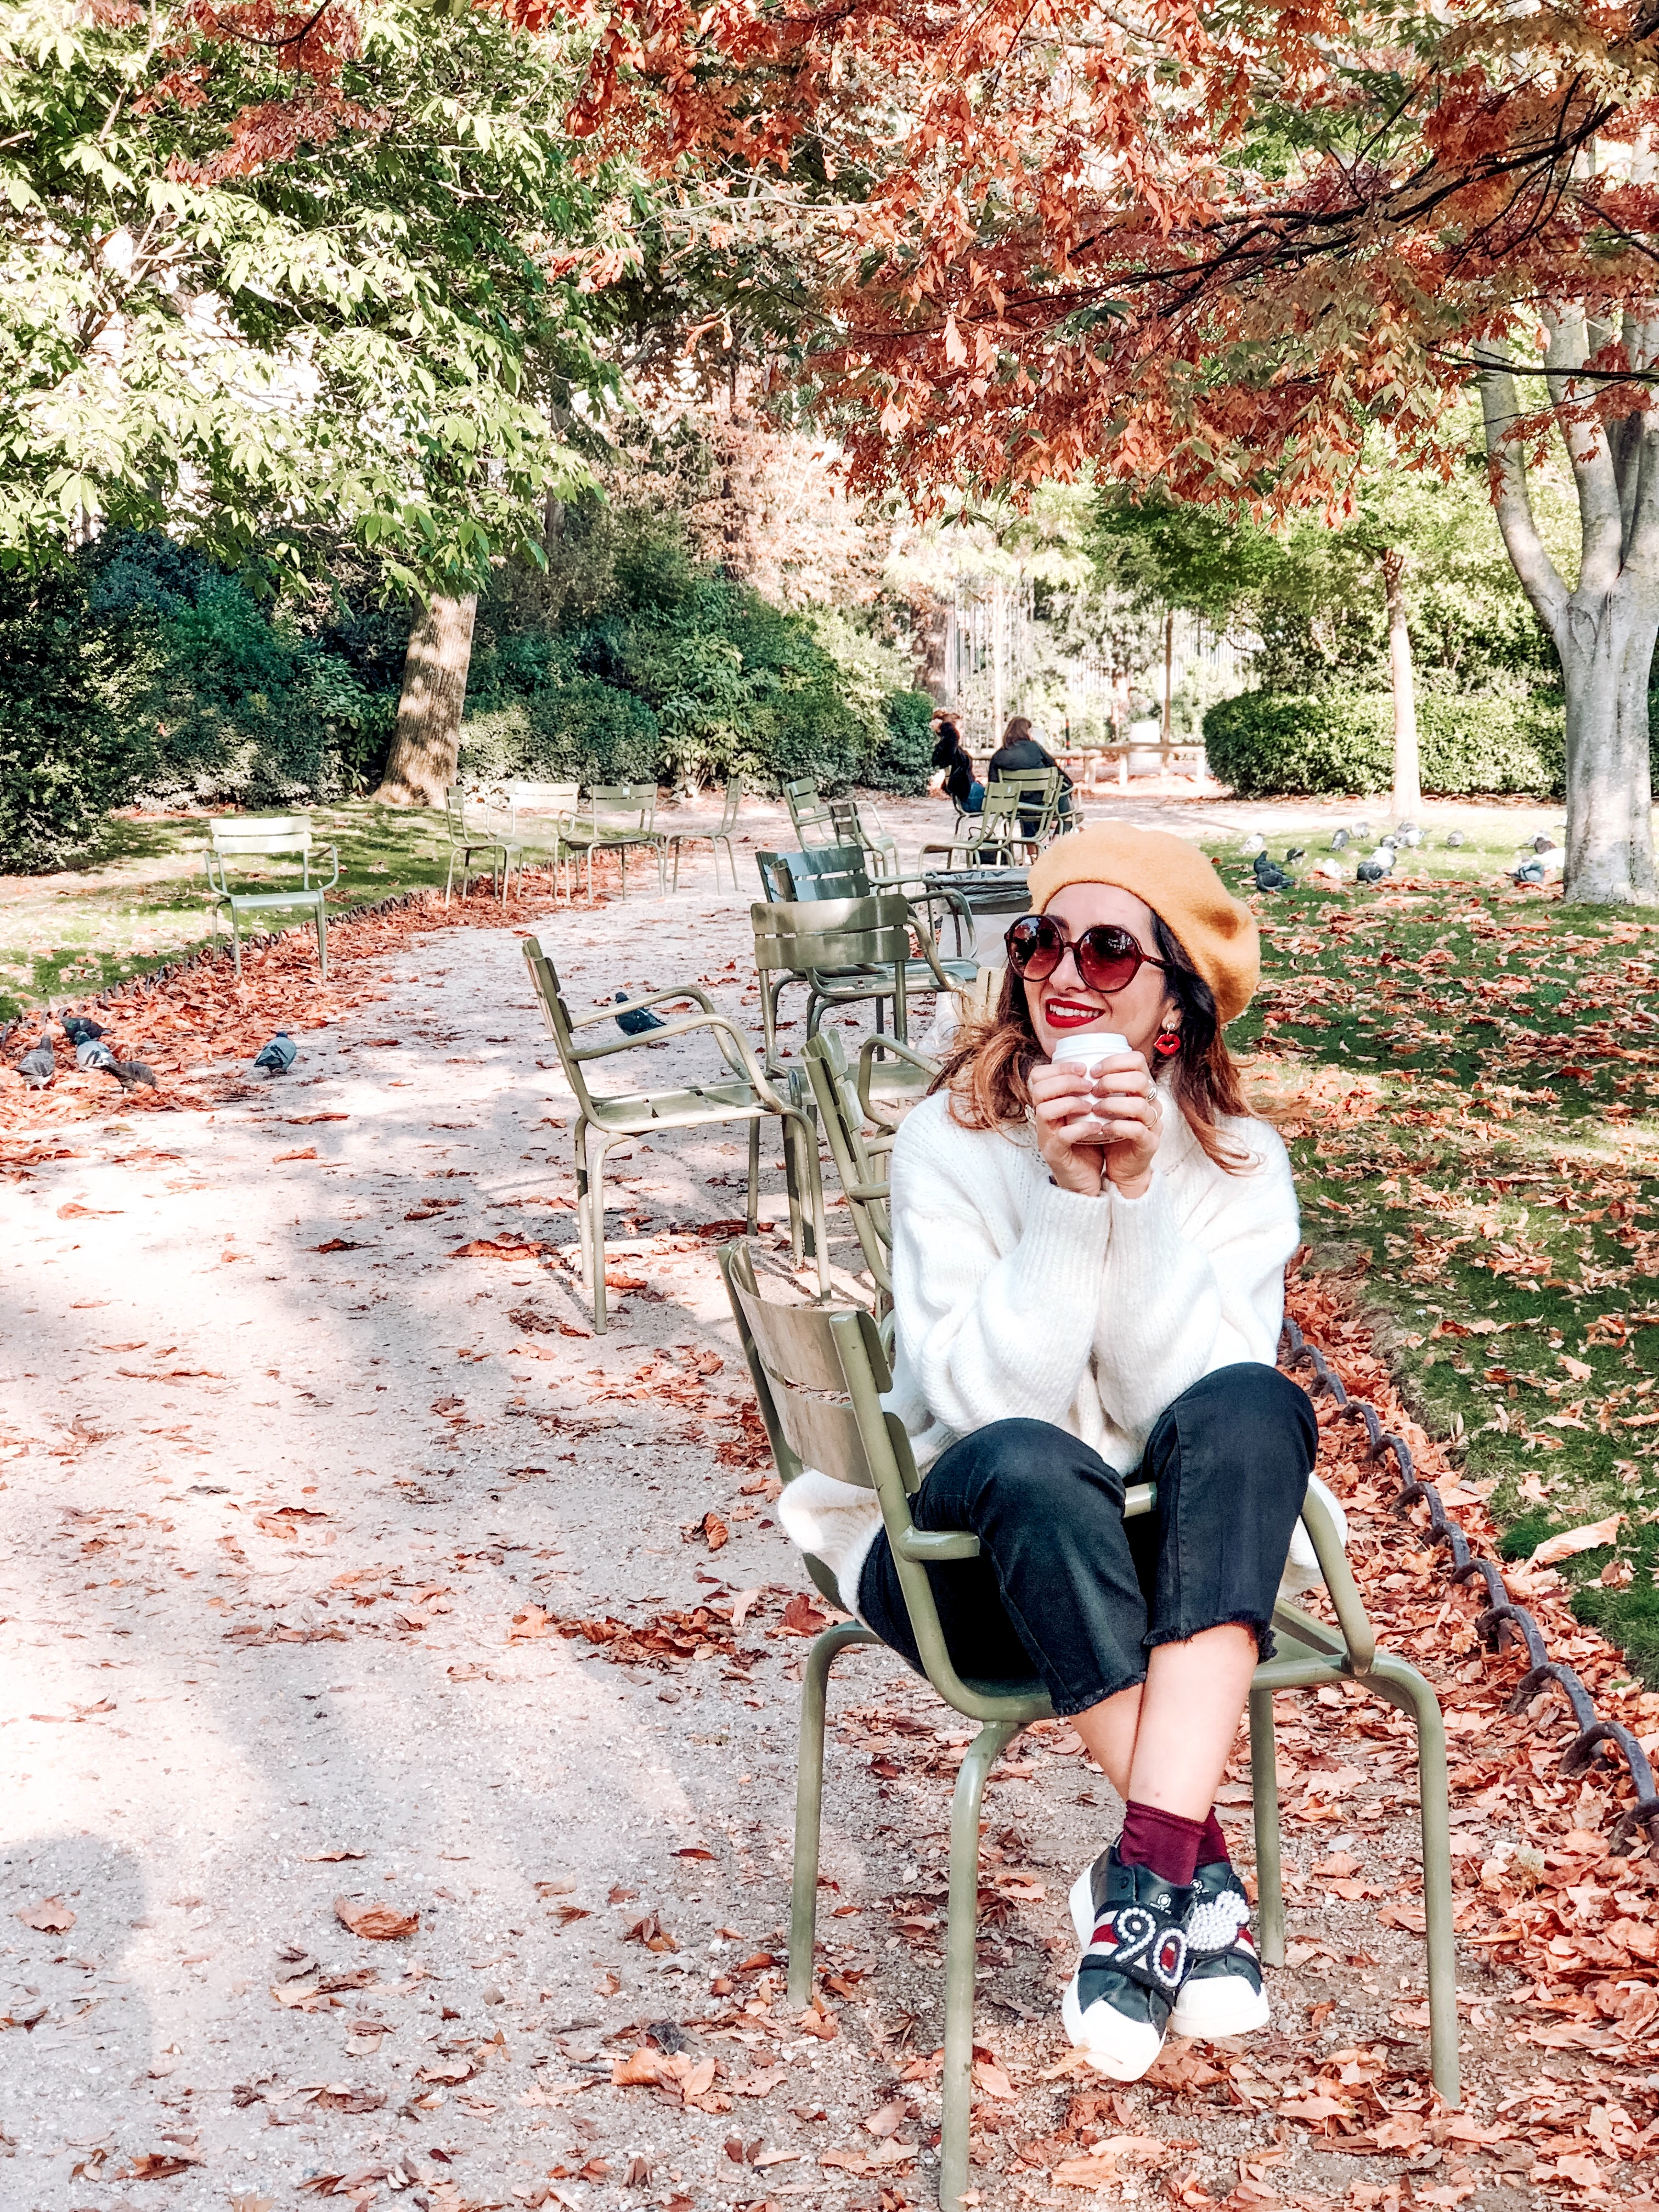 Parigi in autunno, jardin de luxembourg, Impastastorie, impastastorie bistrot, autumn in paris,